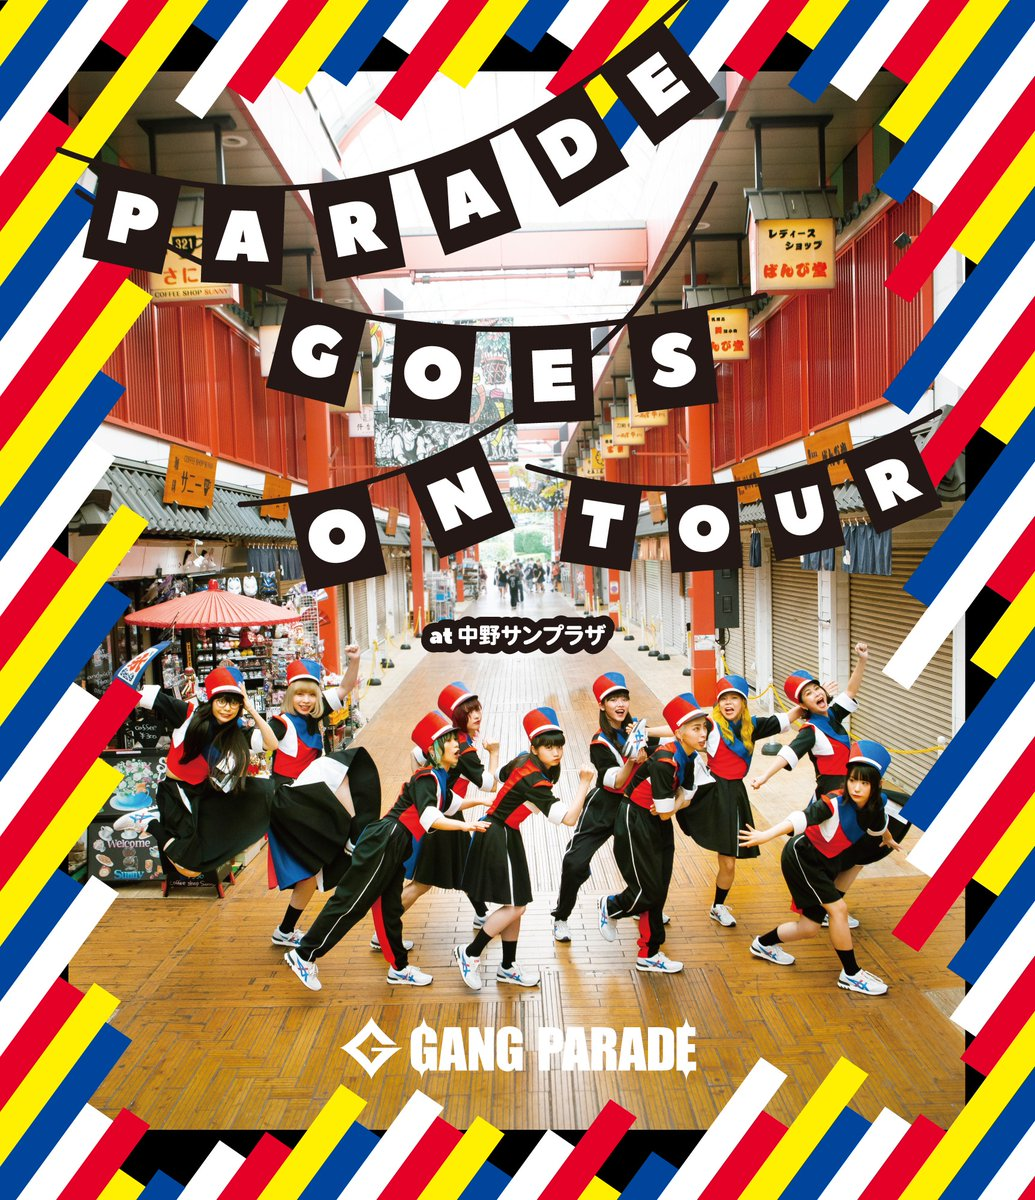 PARADE GOES ON TOUR at Nakano Sunplaza